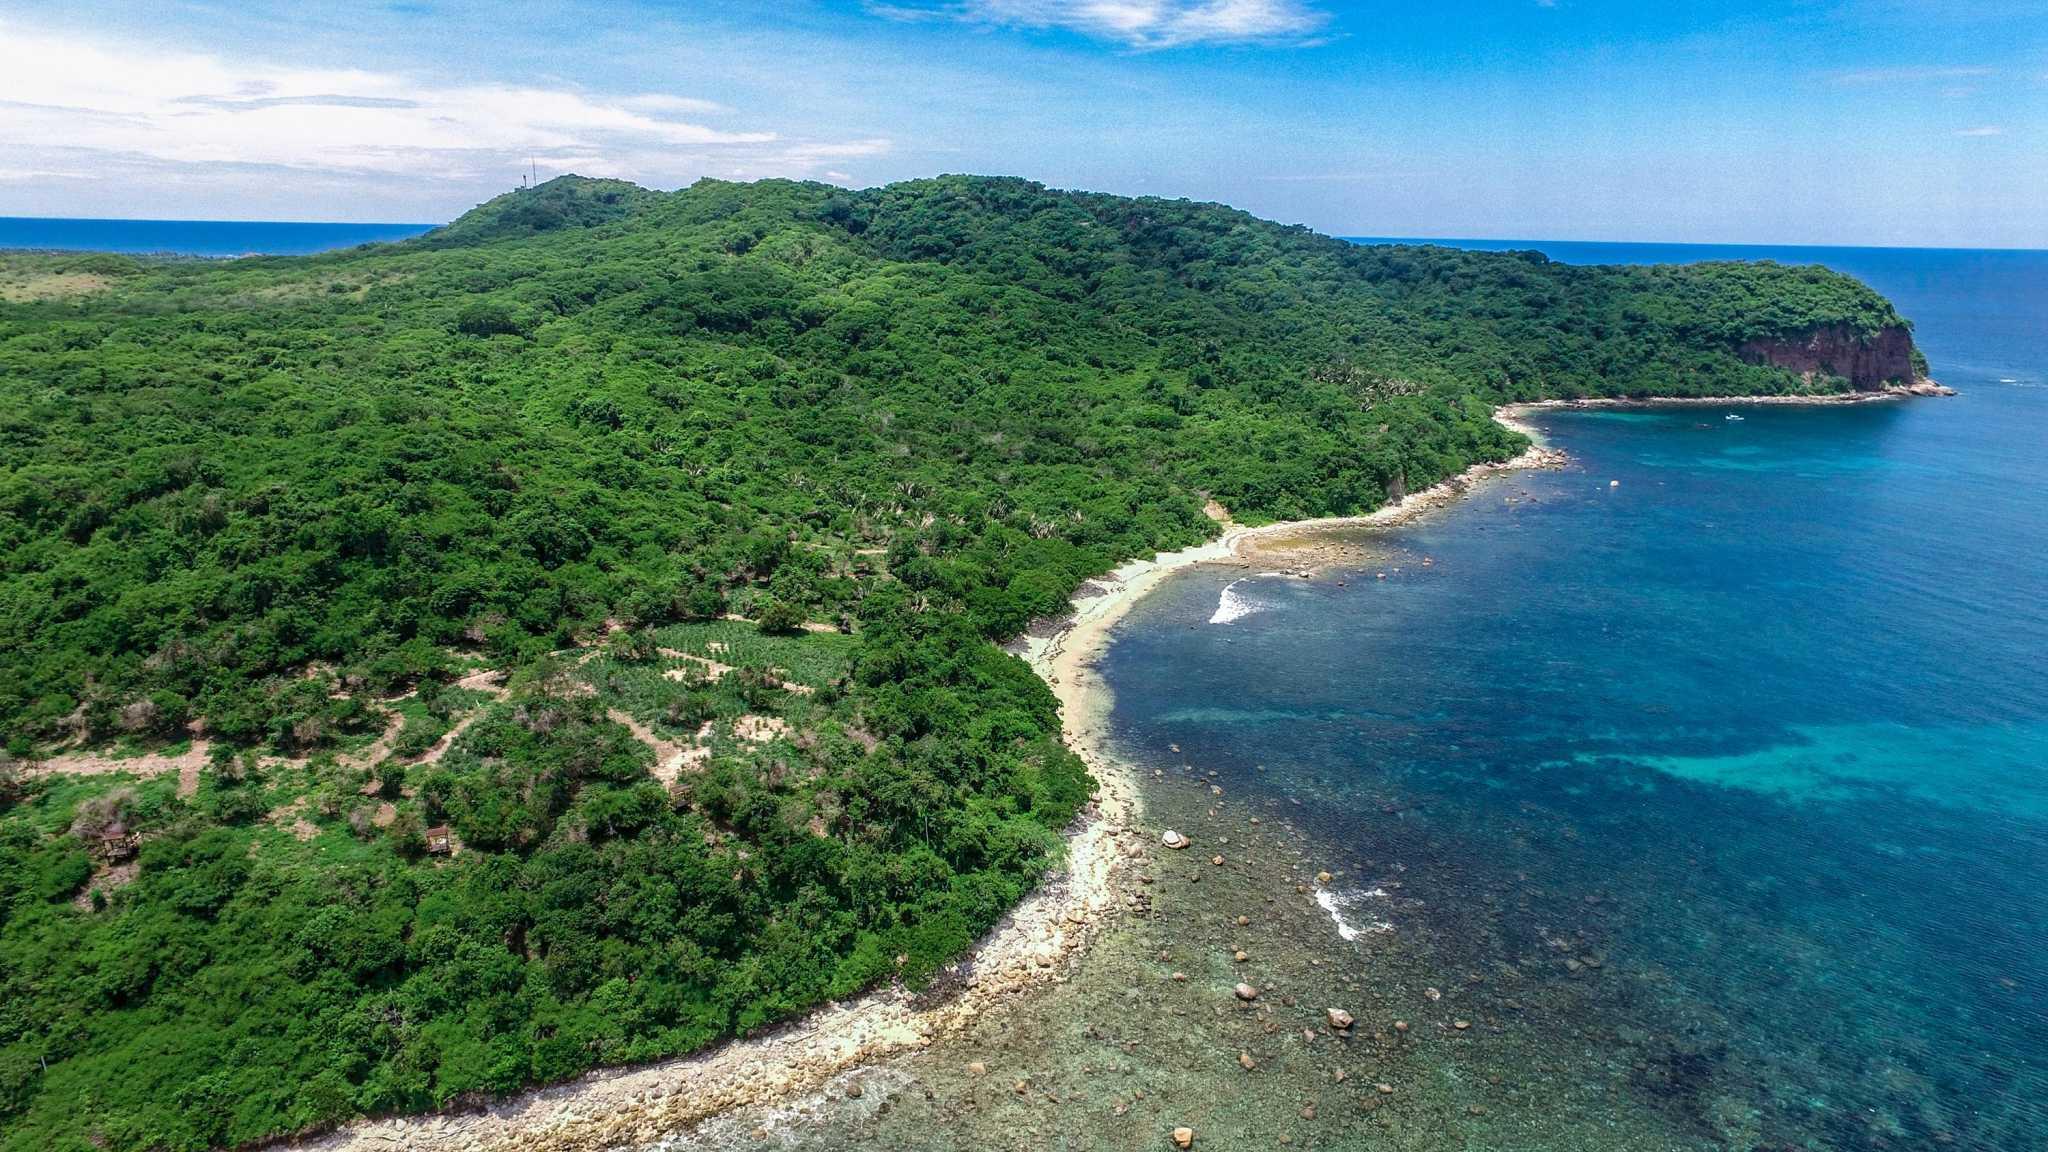 Getaway: Punta Mita Mexico's Iyari villas offer oceanfront living in tropical paradise